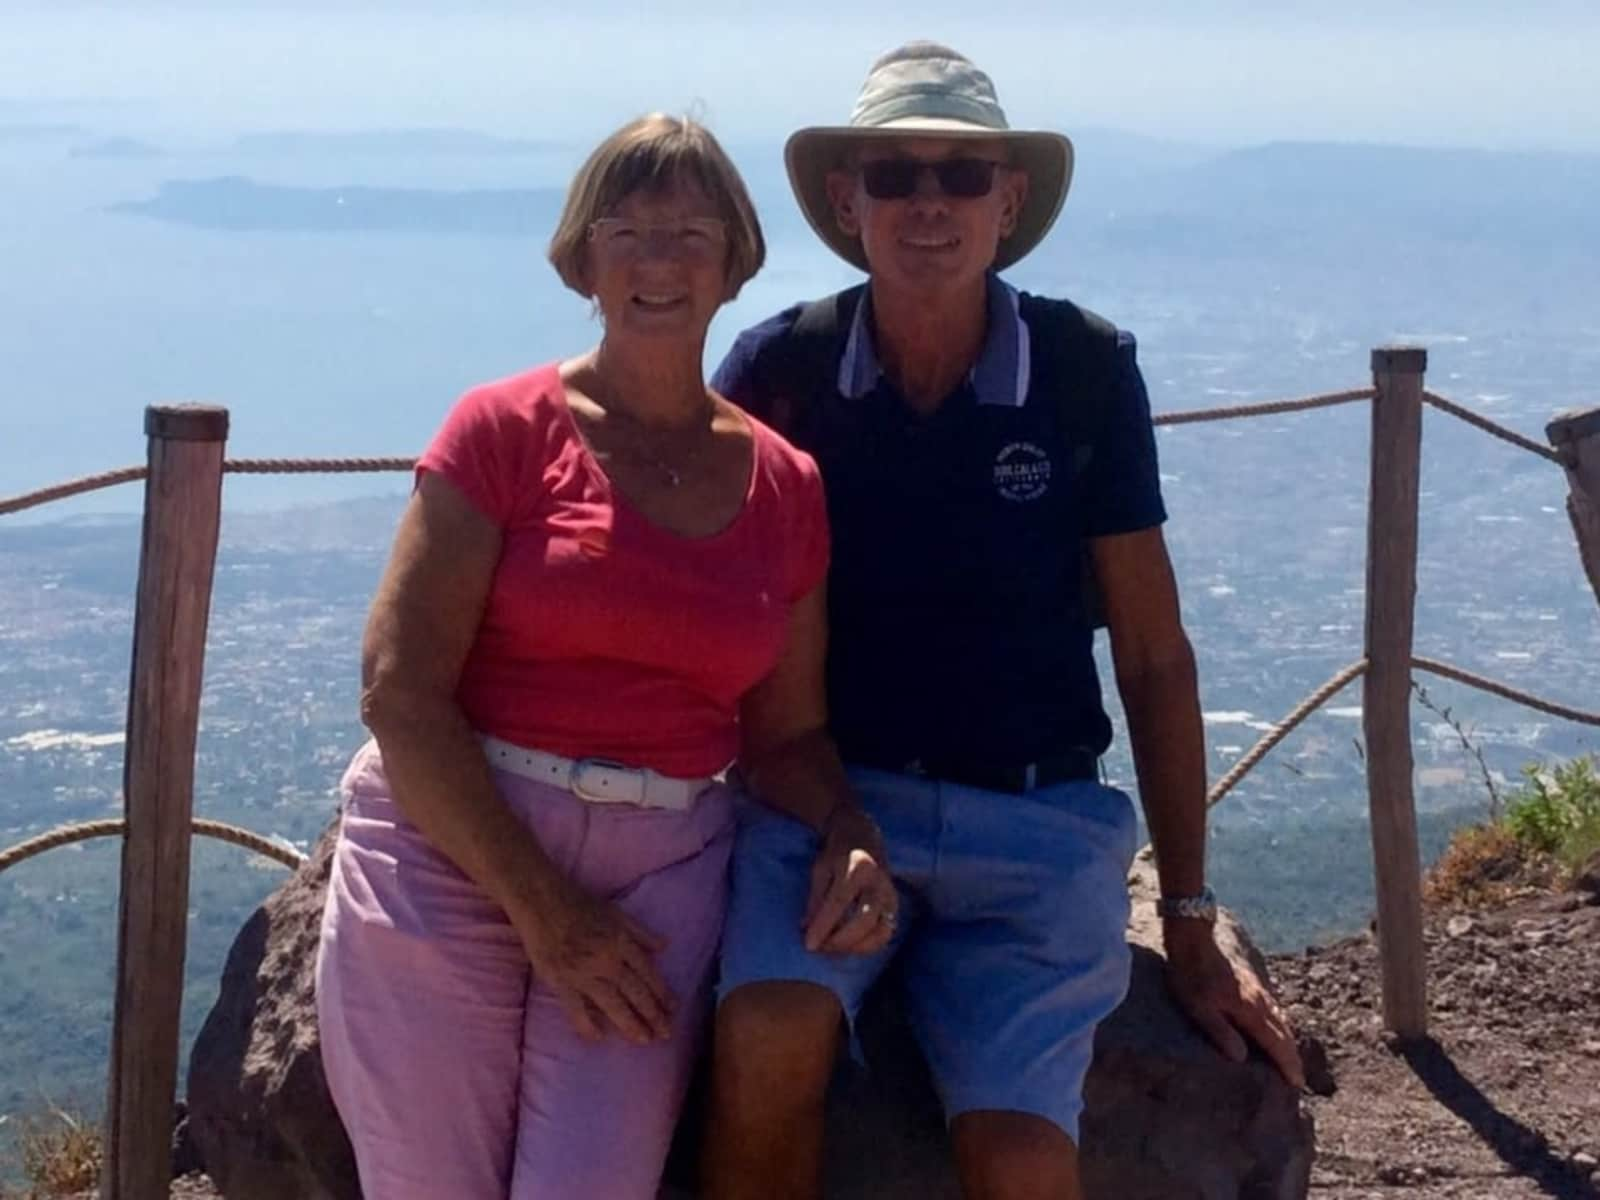 Jenni & John from Lubrín, Spain